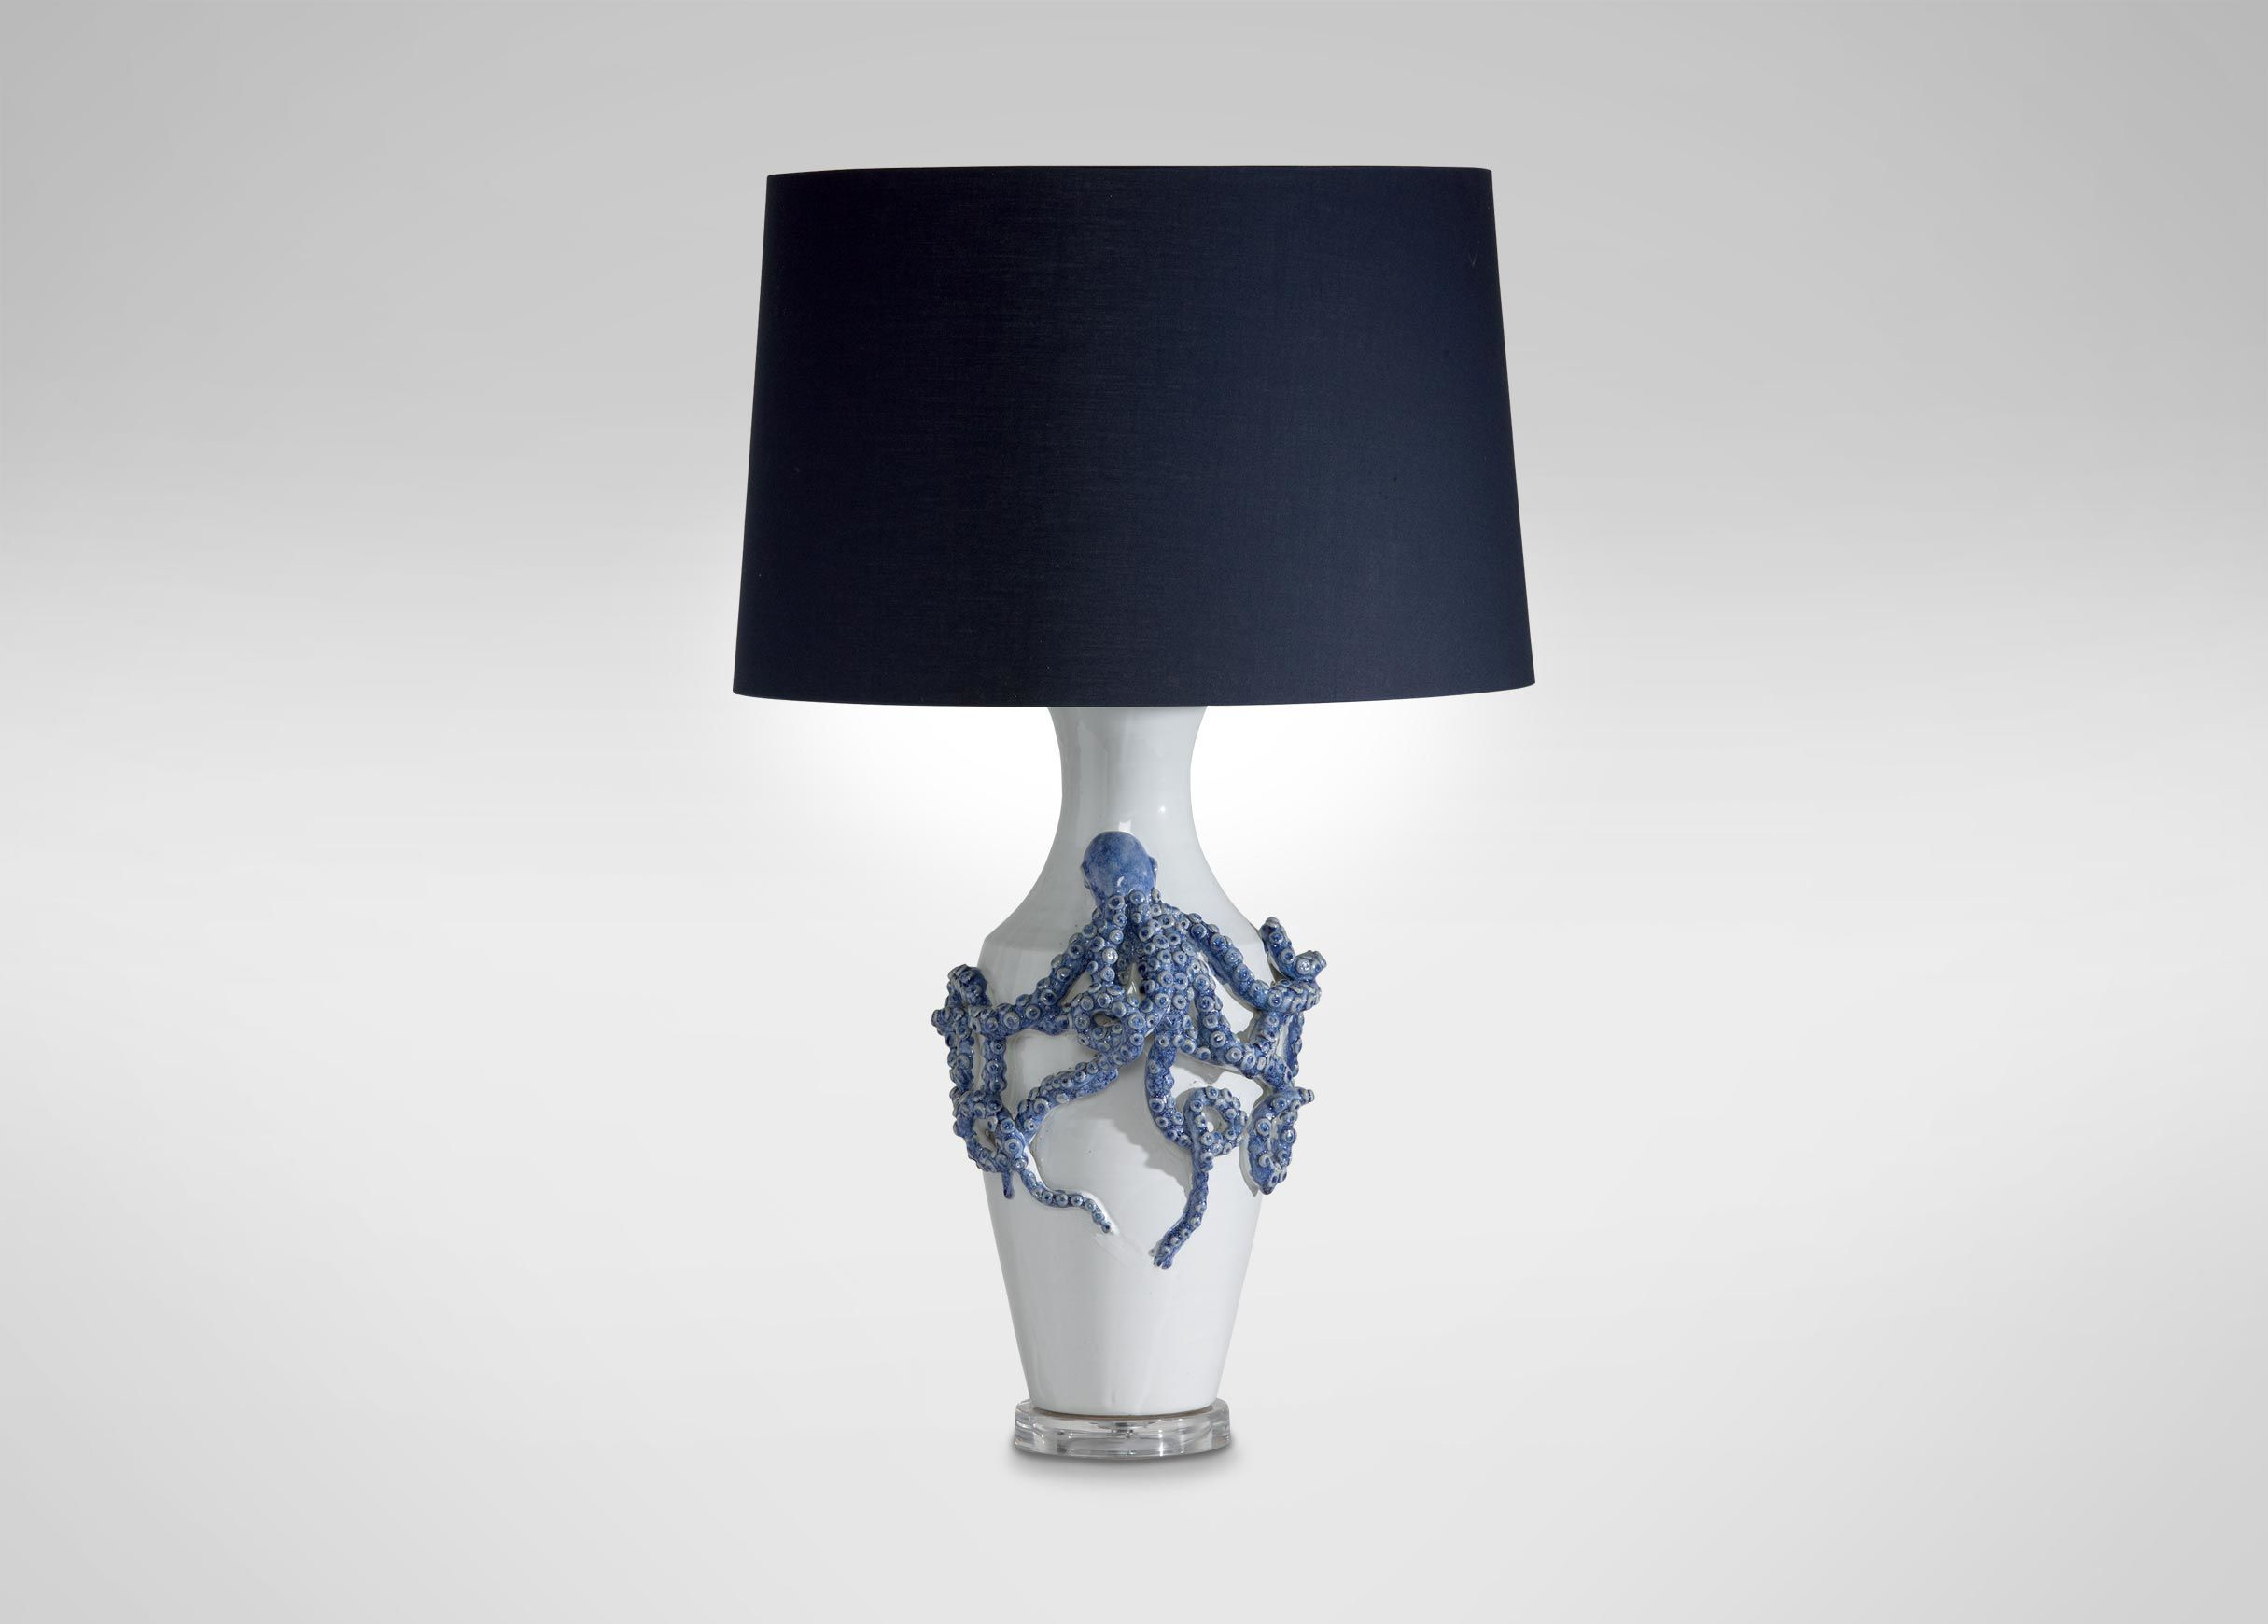 Oedipus table lamp ethan allen schaumburg